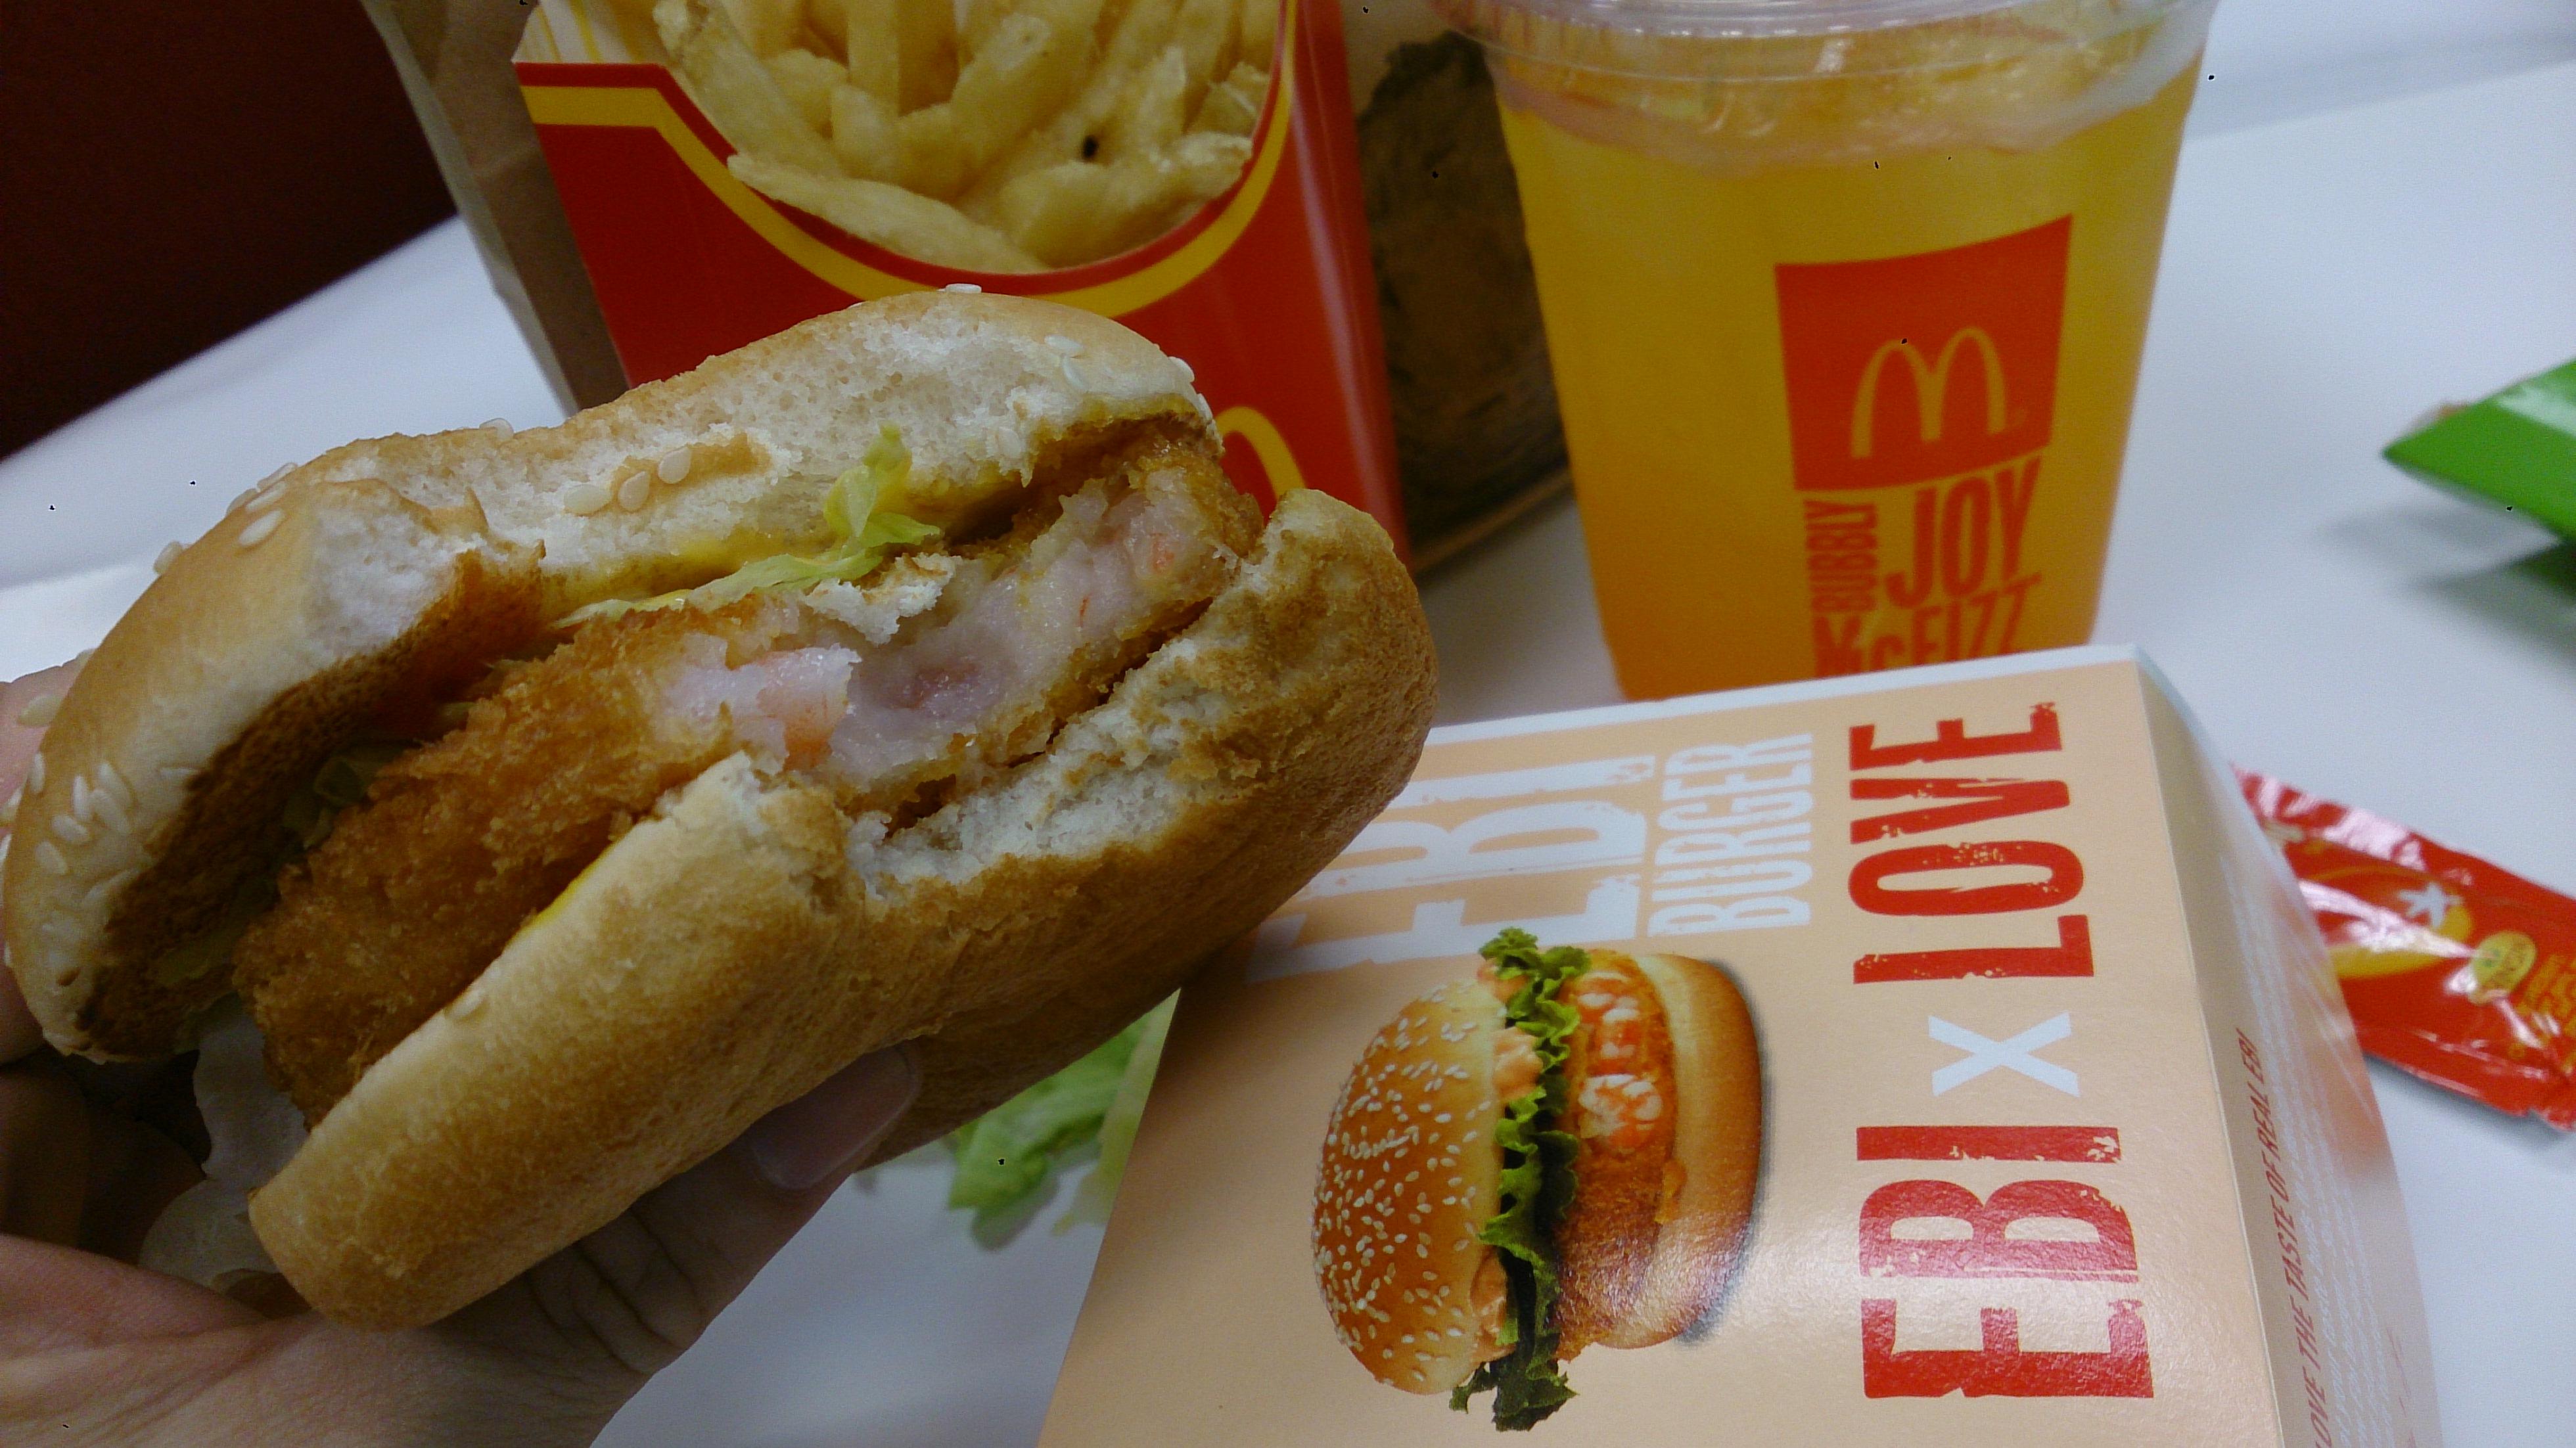 Pictures of Mcdonalds Meals a Mcdonald's Ebi Feast Meal